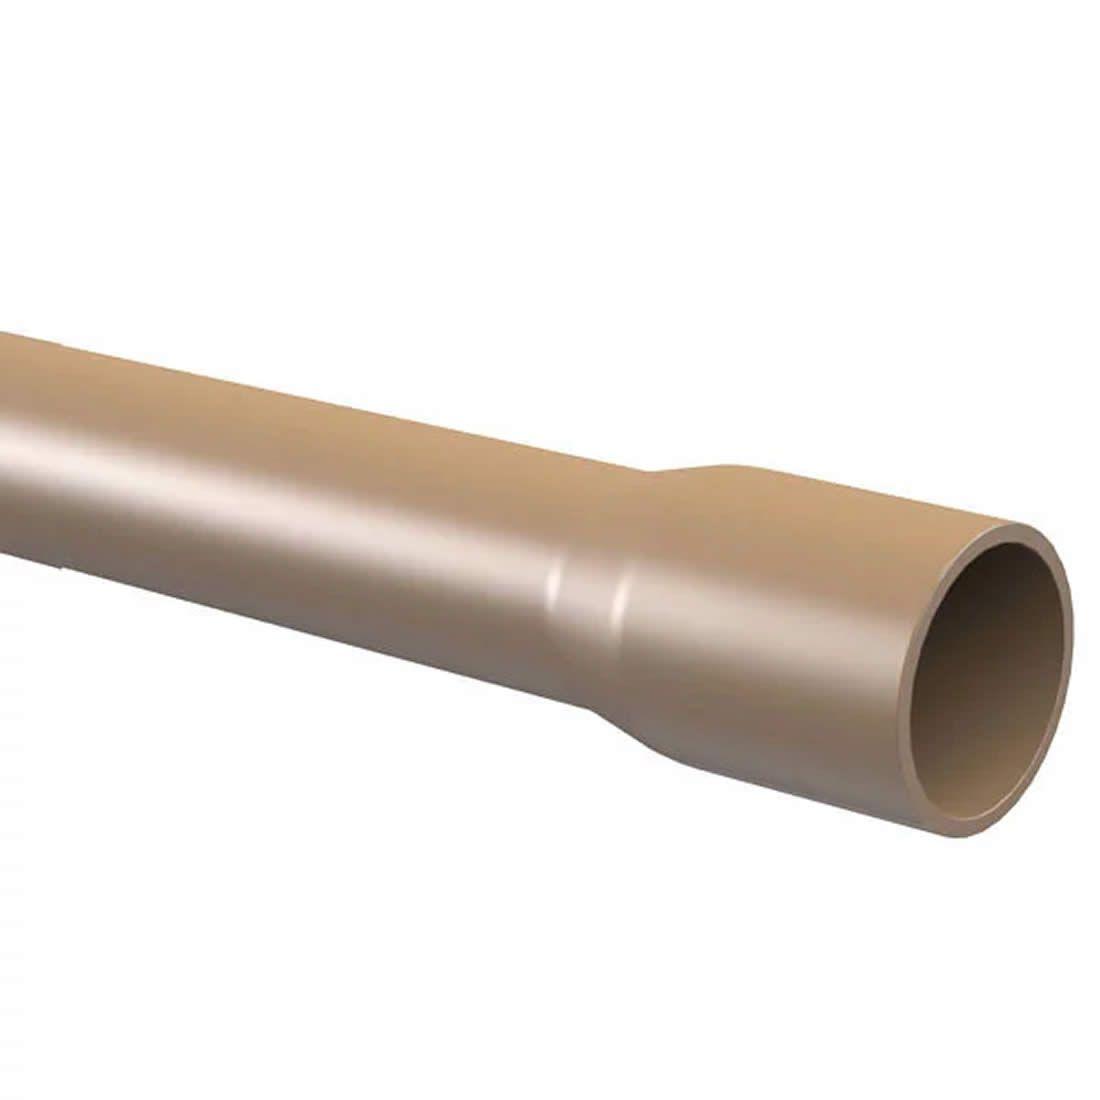 Tubo PVC Soldável 25mm X 6 Metros Tigre